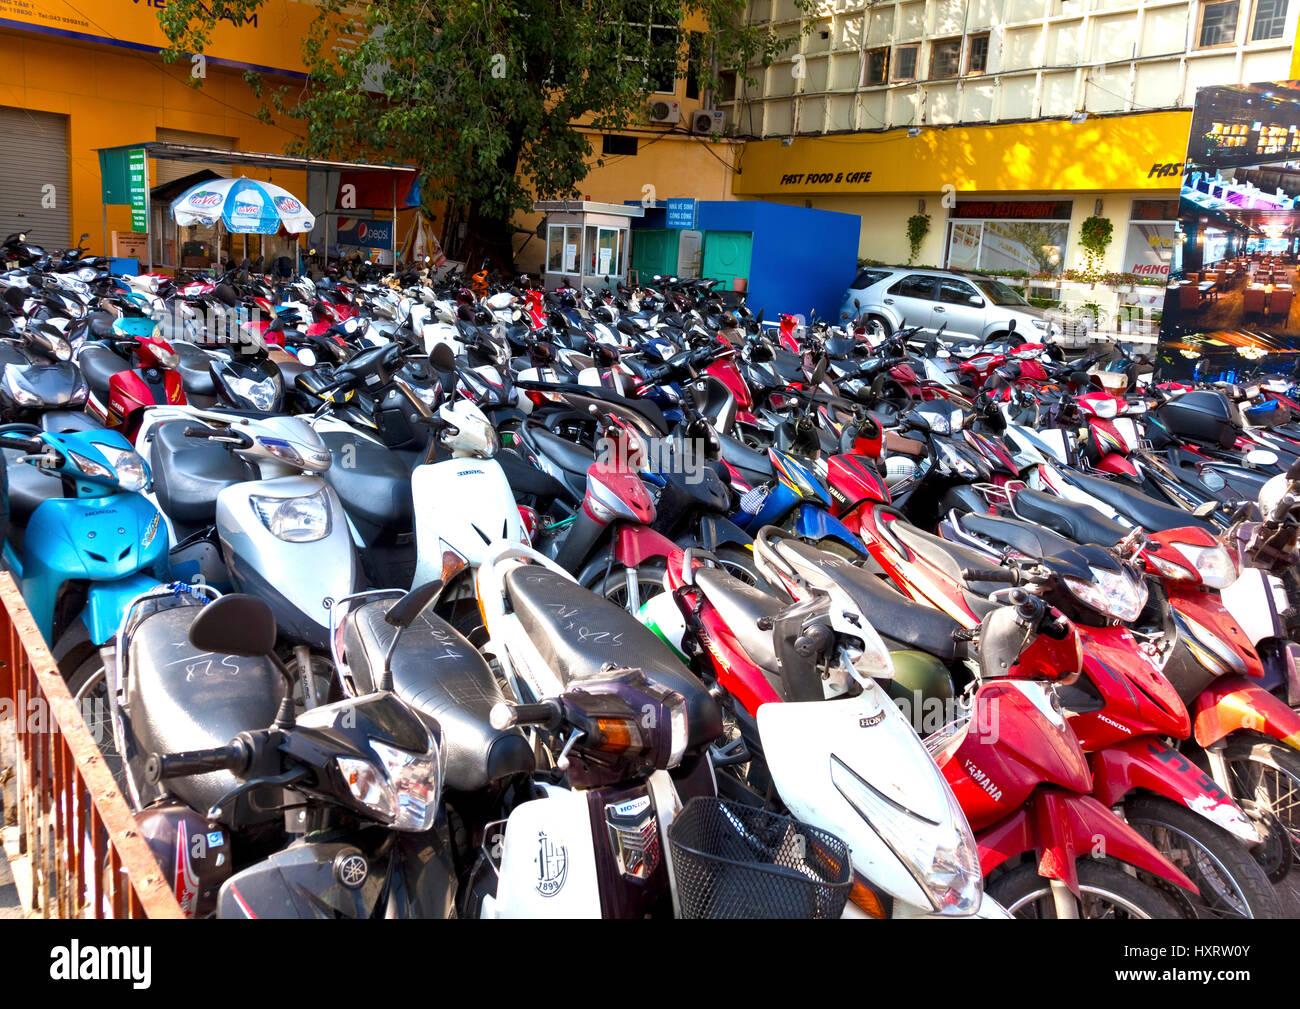 Motor bikes tightly packed at car park in Hanoi 2. Vietnam has 38 million registered motorbikes - Stock Image